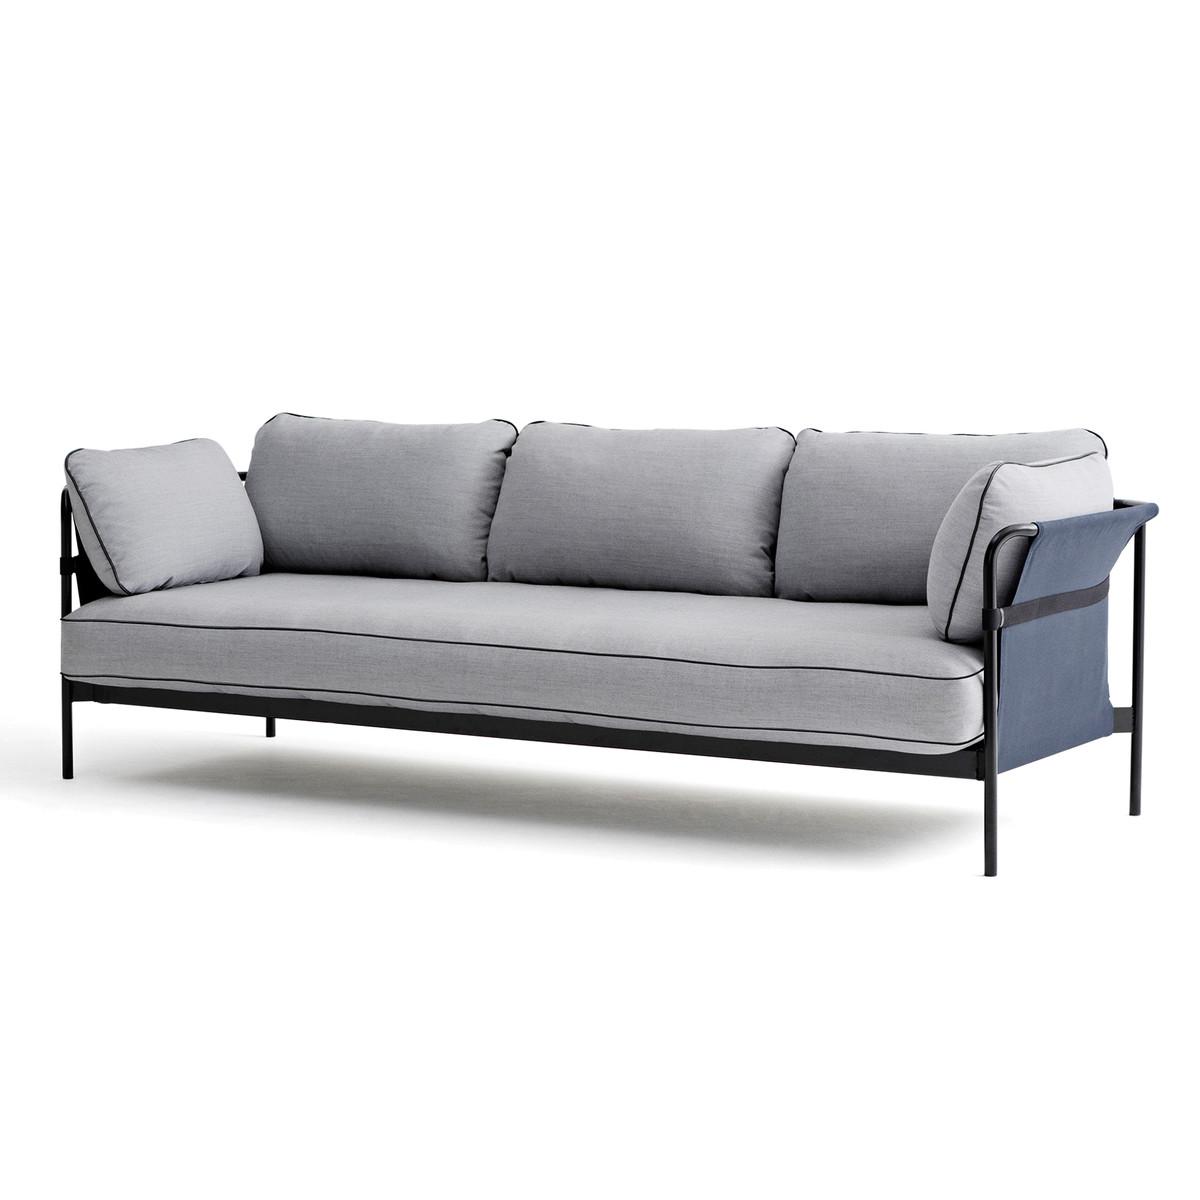 hay can sofa 3 sitzer schwarz canvas blau surface 120 hellgrau eu hellgrau t 89 h 82 b. Black Bedroom Furniture Sets. Home Design Ideas